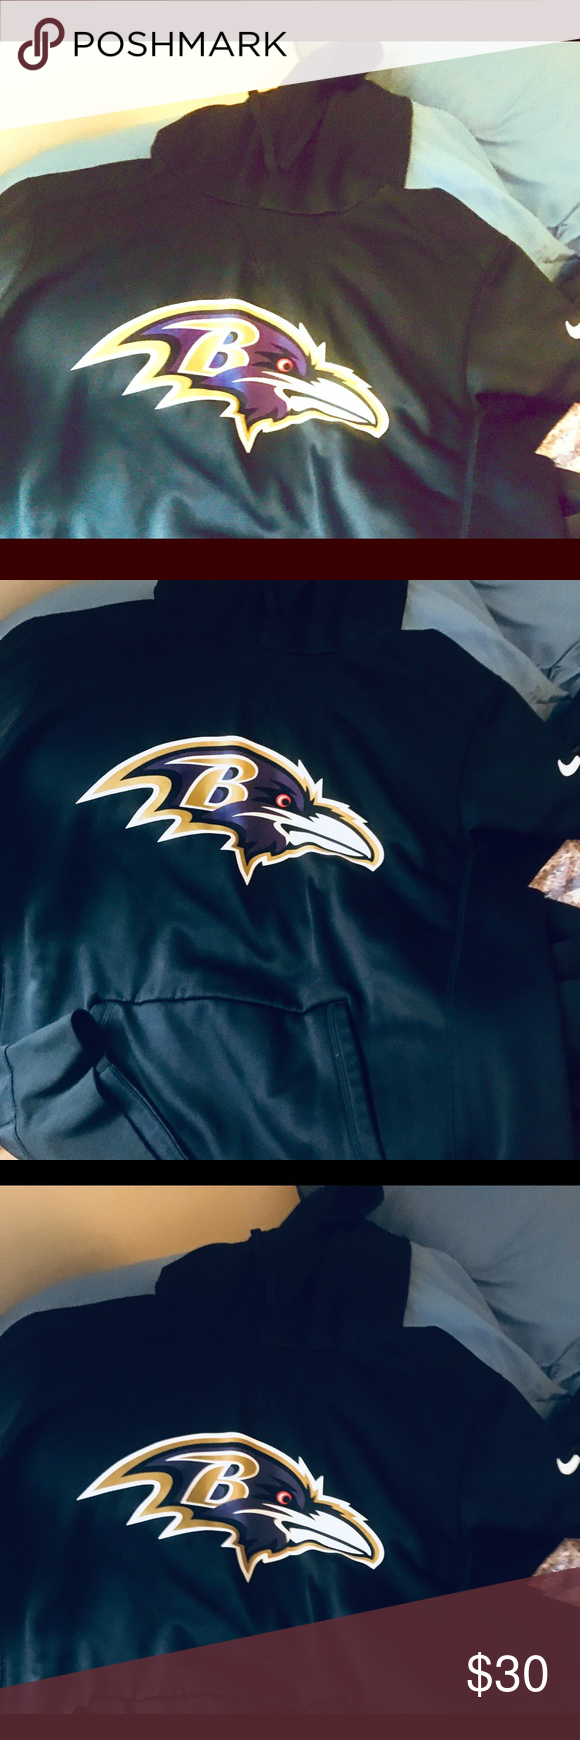 Predownload: Baltimore Ravens Sweatshirt Practically New Warm Sweatshirts Sweatshirts Sweatshirt Shirt [ 1740 x 580 Pixel ]